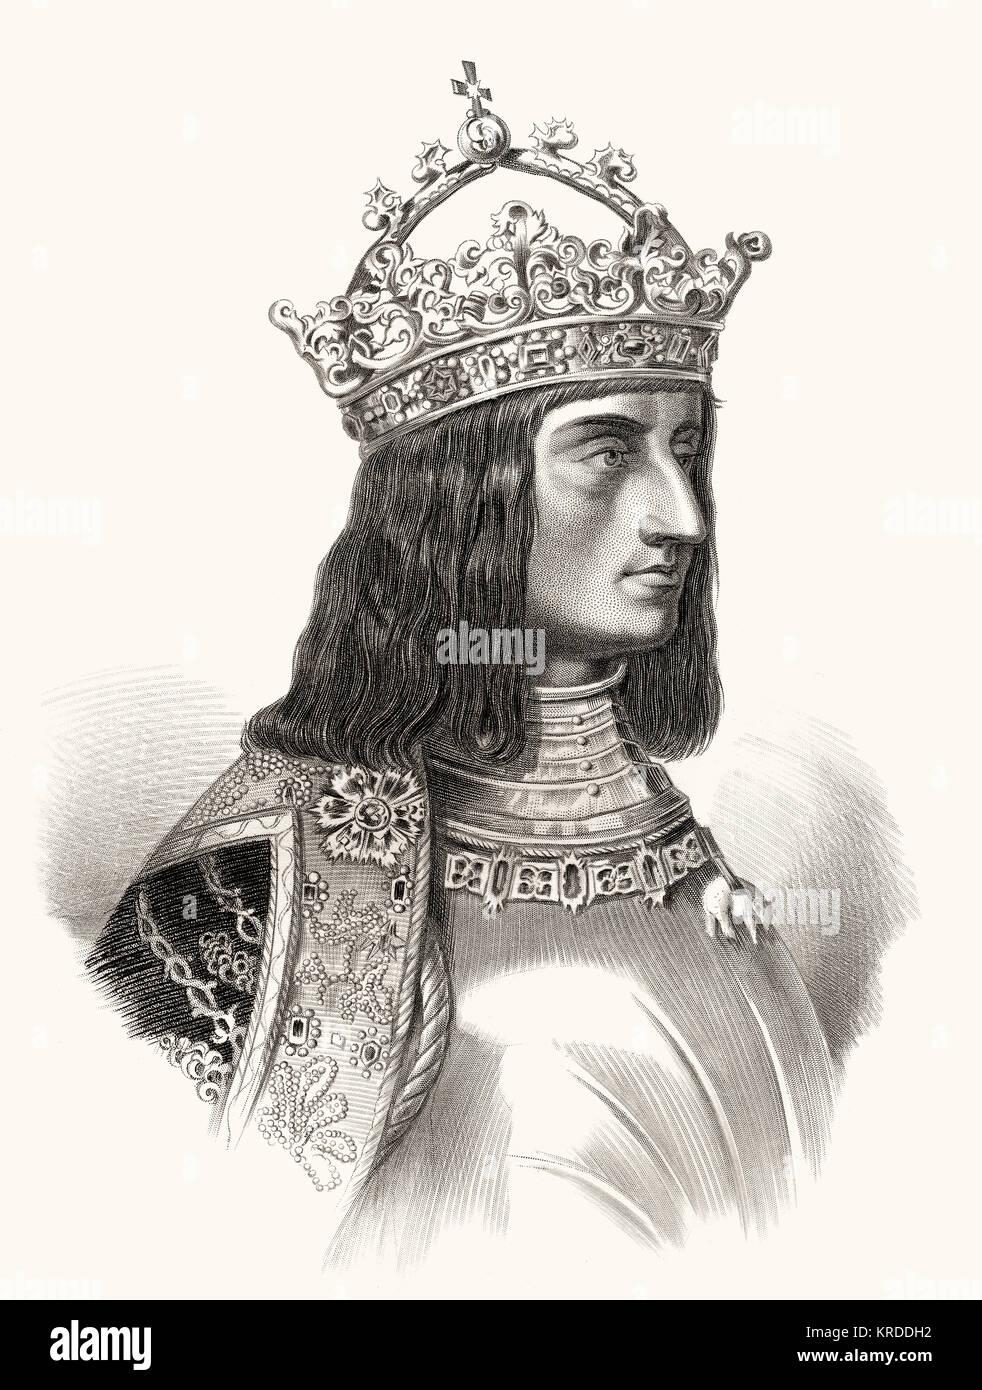 Maximilian I von Habsburg, 1459 -1519, Emperor of the Holy Roman Empire - Stock Image